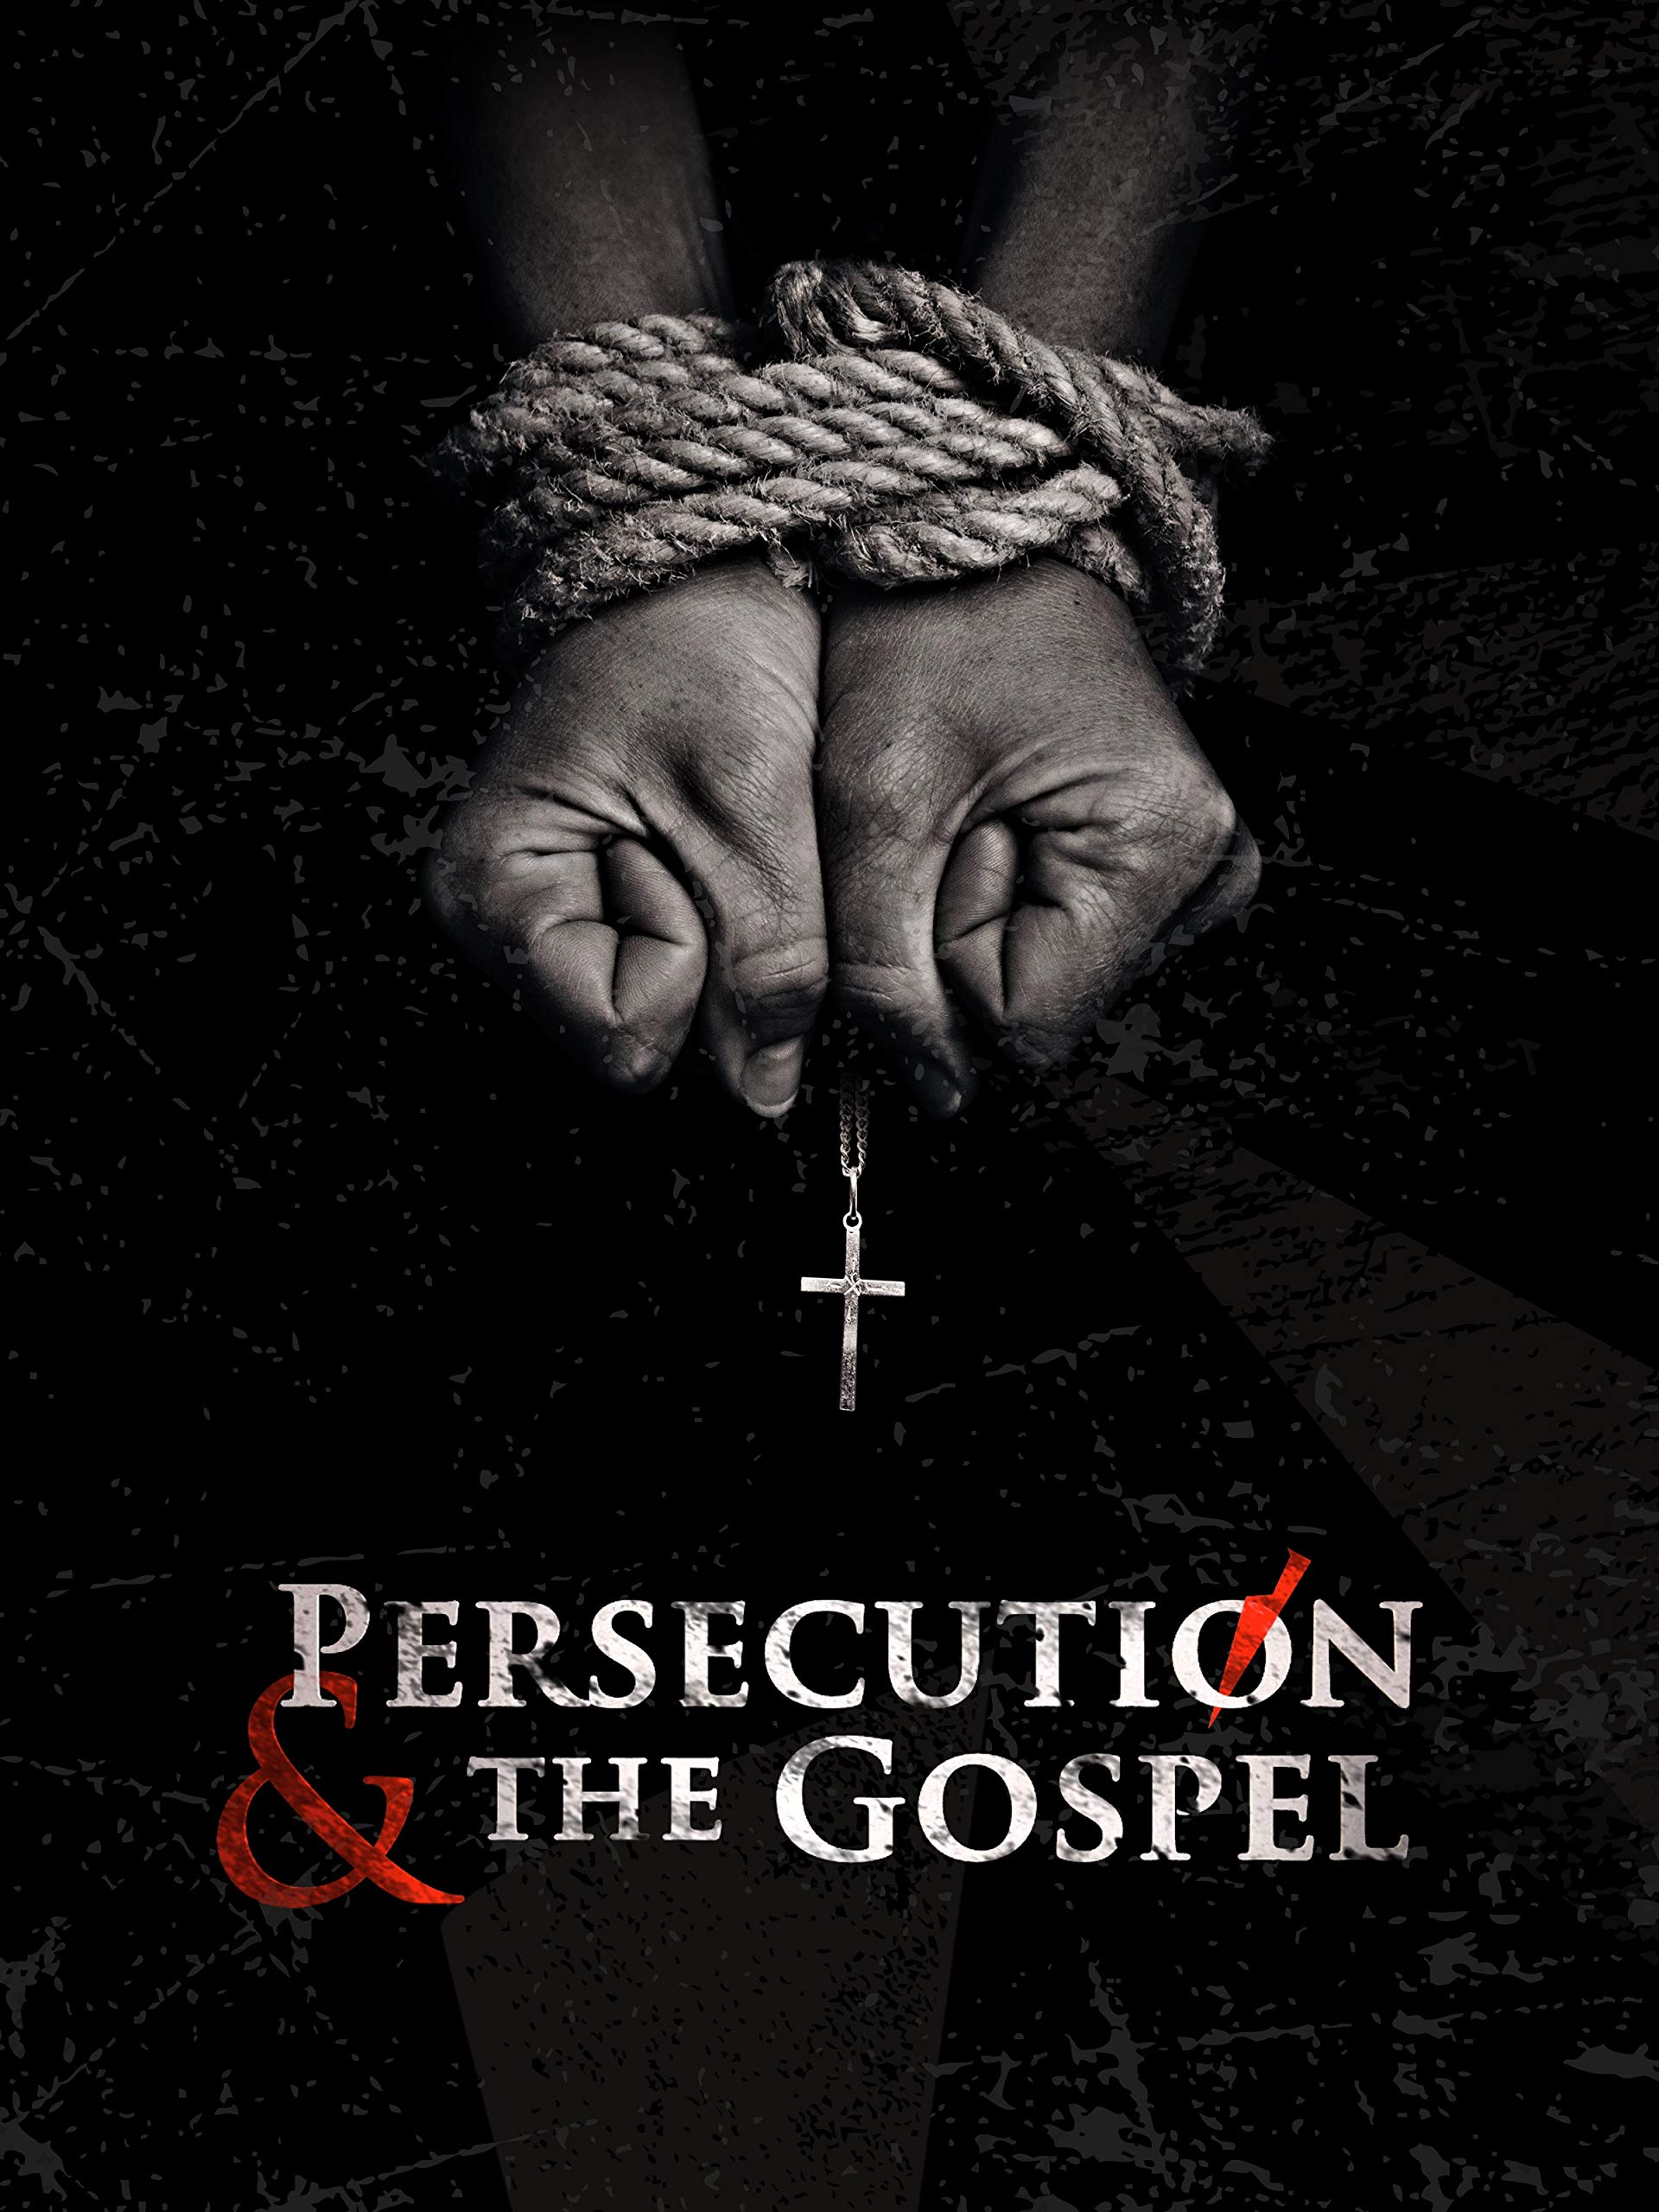 Persecution & the Gospel